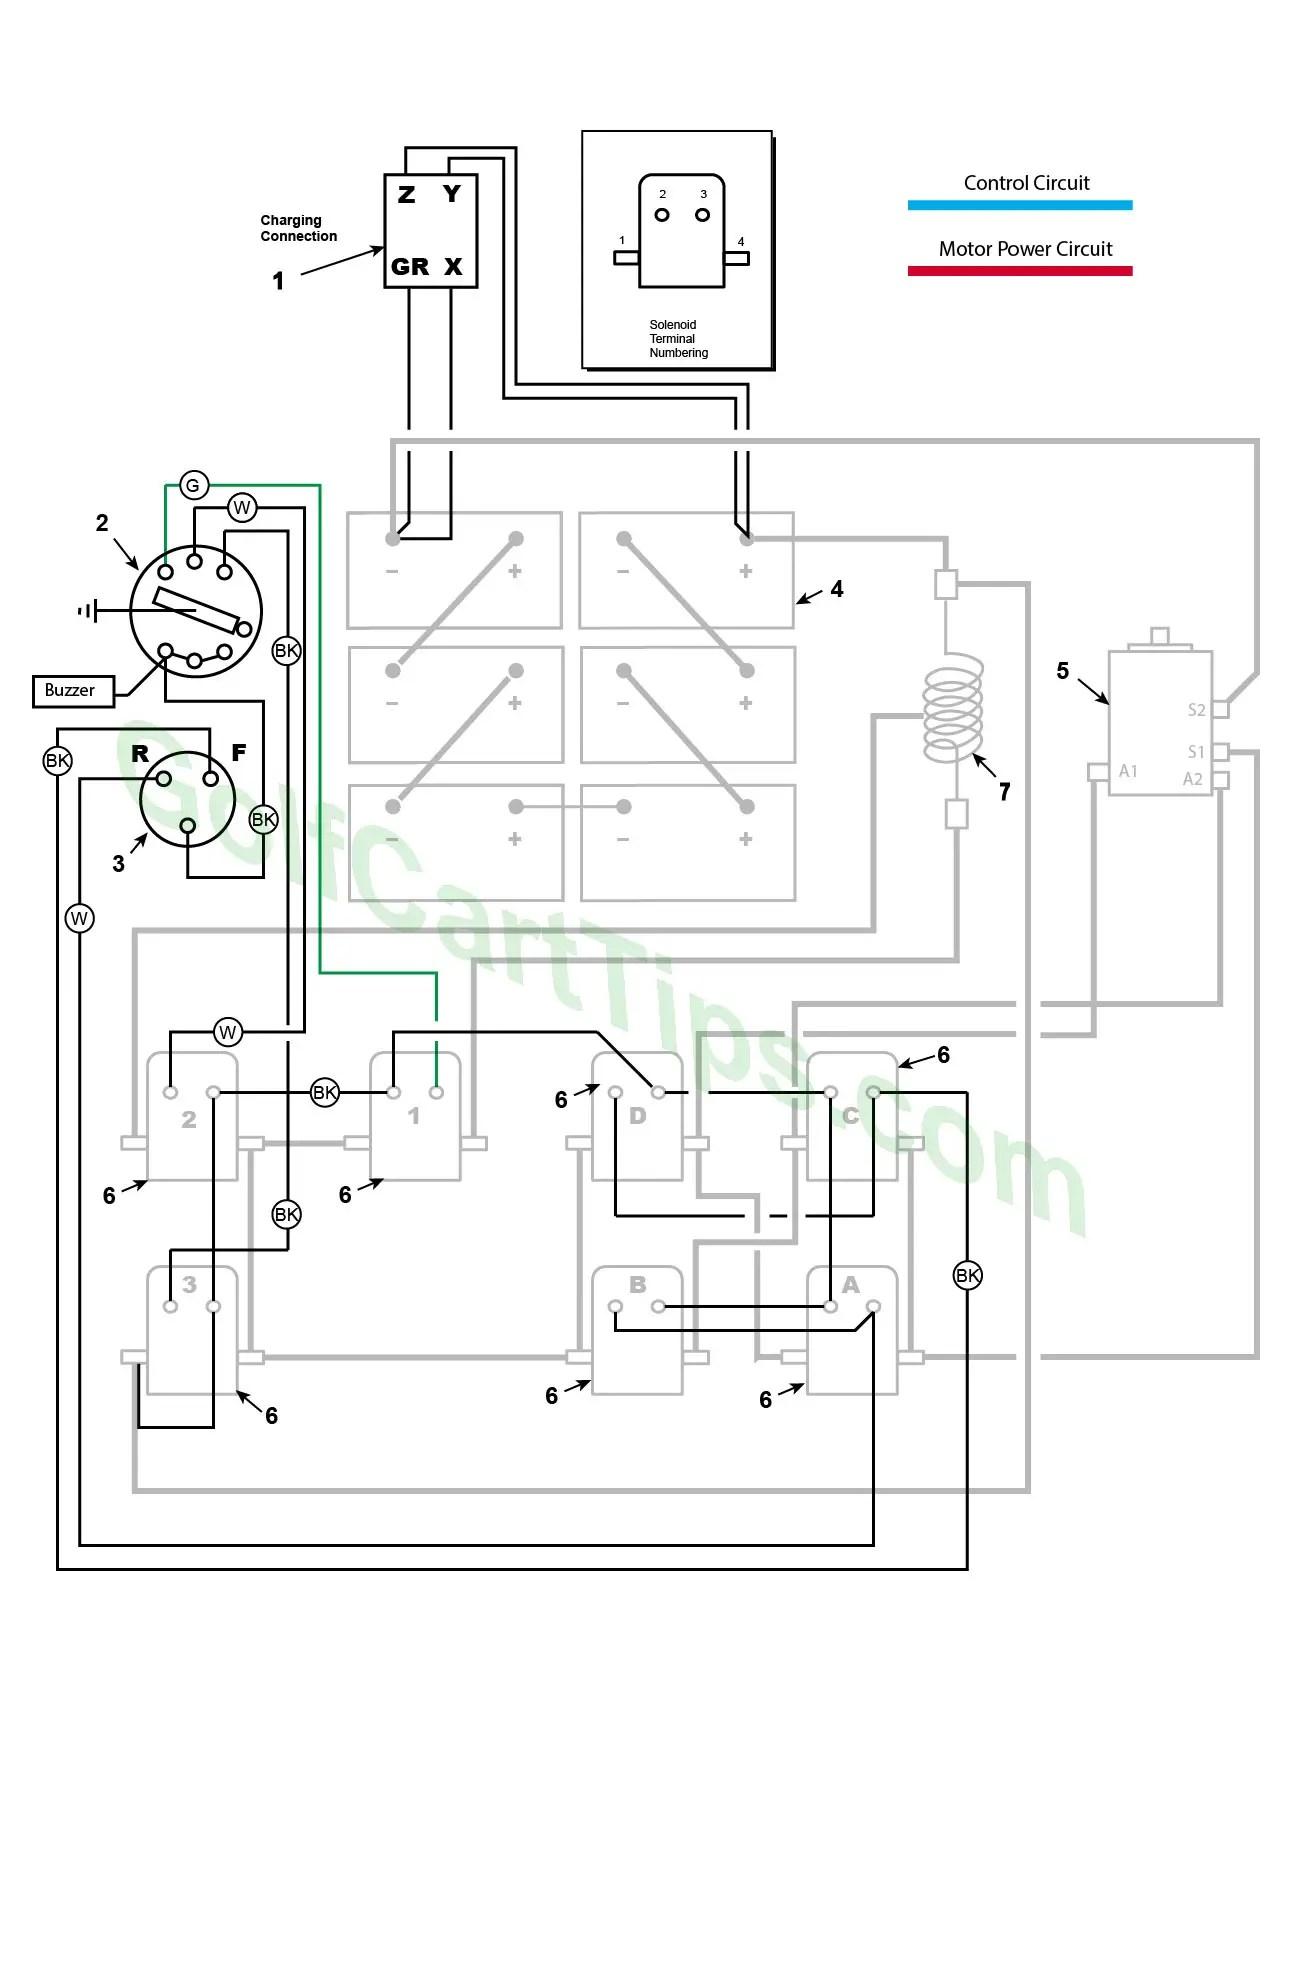 99 ezgo wiring diagram wiring diagram99 ezgo wiring diagram